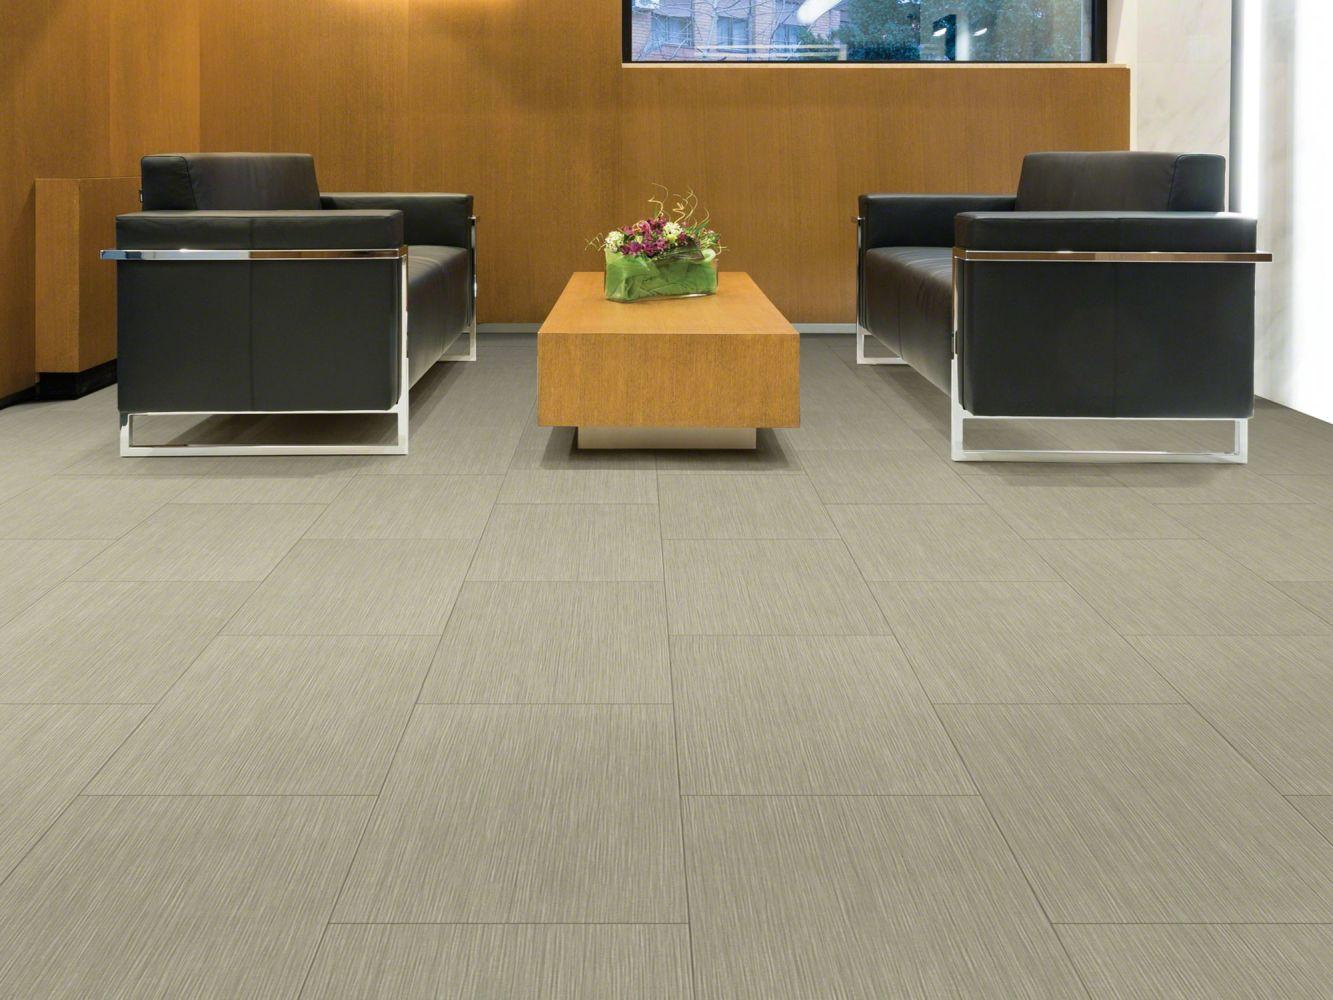 Shaw Floors Vinyl Home Foundations Turninstone 720c Plus Sediment 00789_521RG